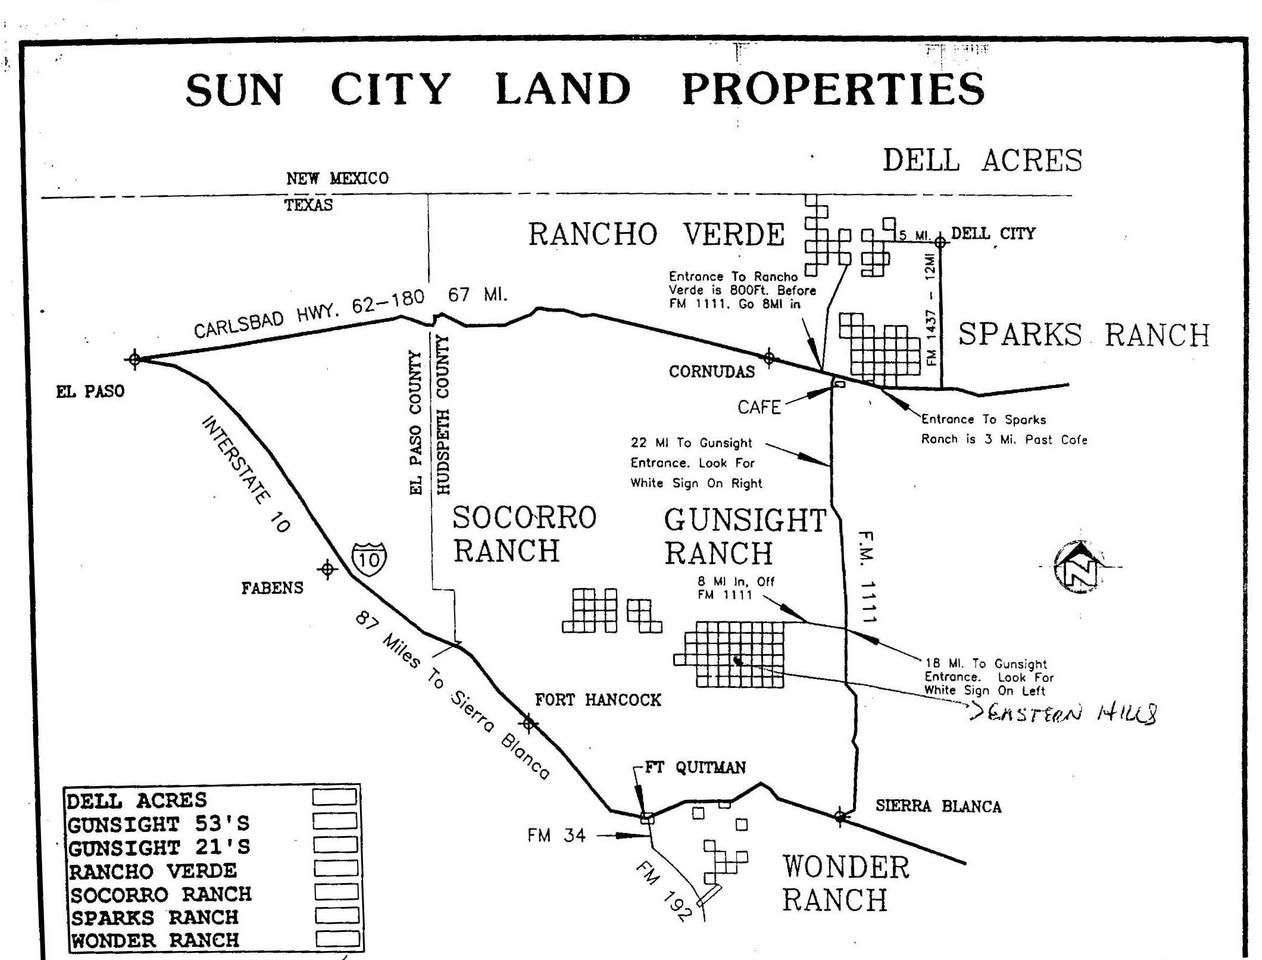 19 Sec 12 Psl Gunsight Ranch R - Photo 1